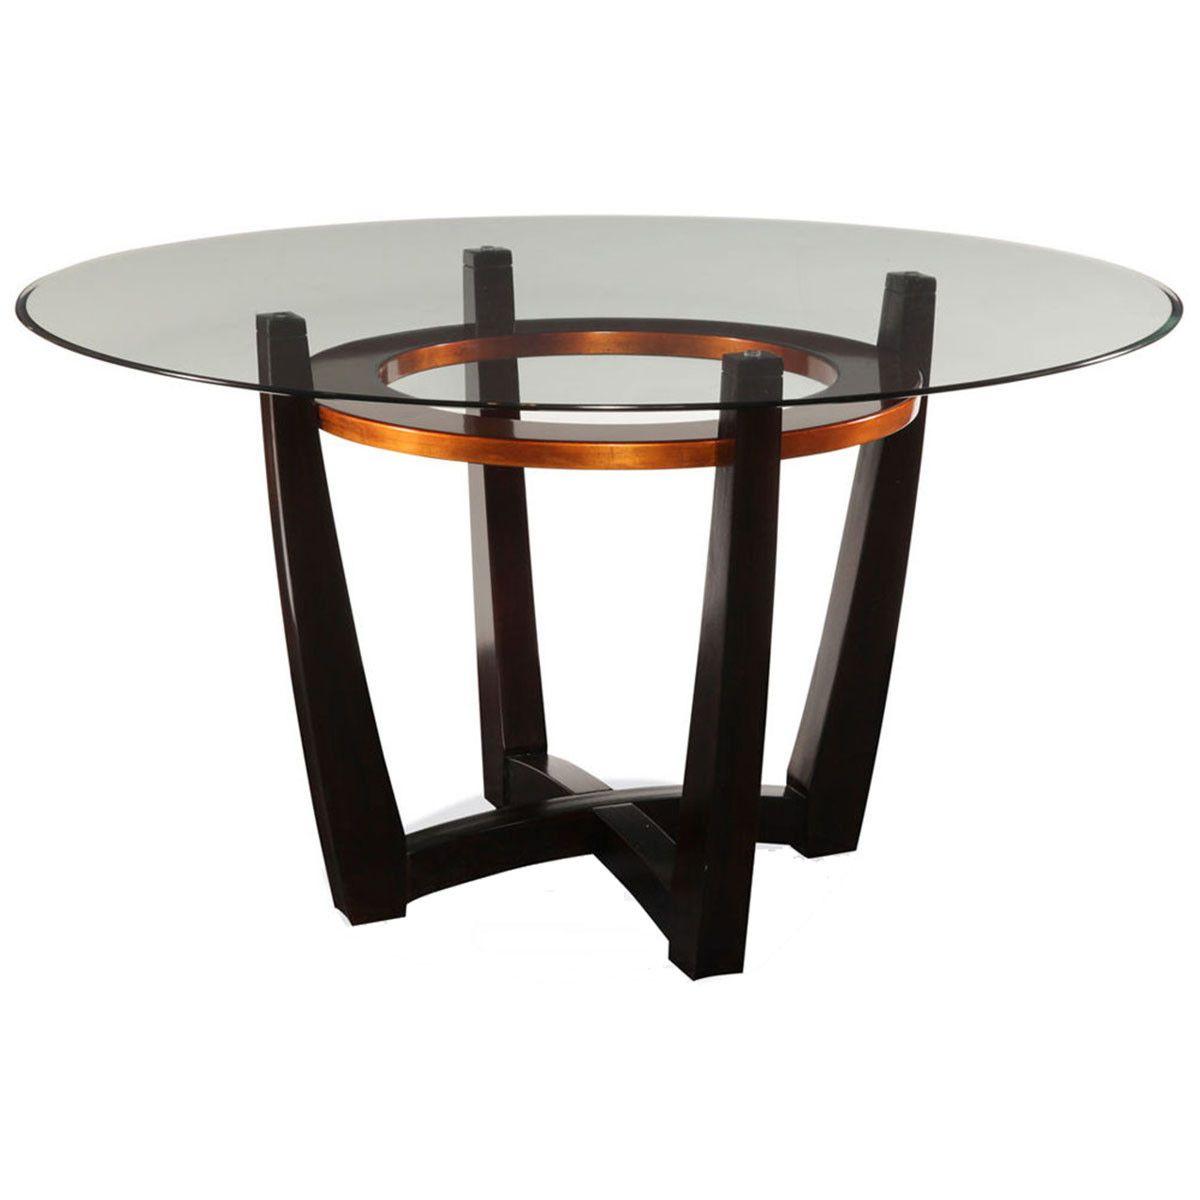 Bassett Mirror Elation Dining Table D1078 700 095ec Mesas De Comedor Comedor Redonda Comedores Pequenos [ 1200 x 1200 Pixel ]